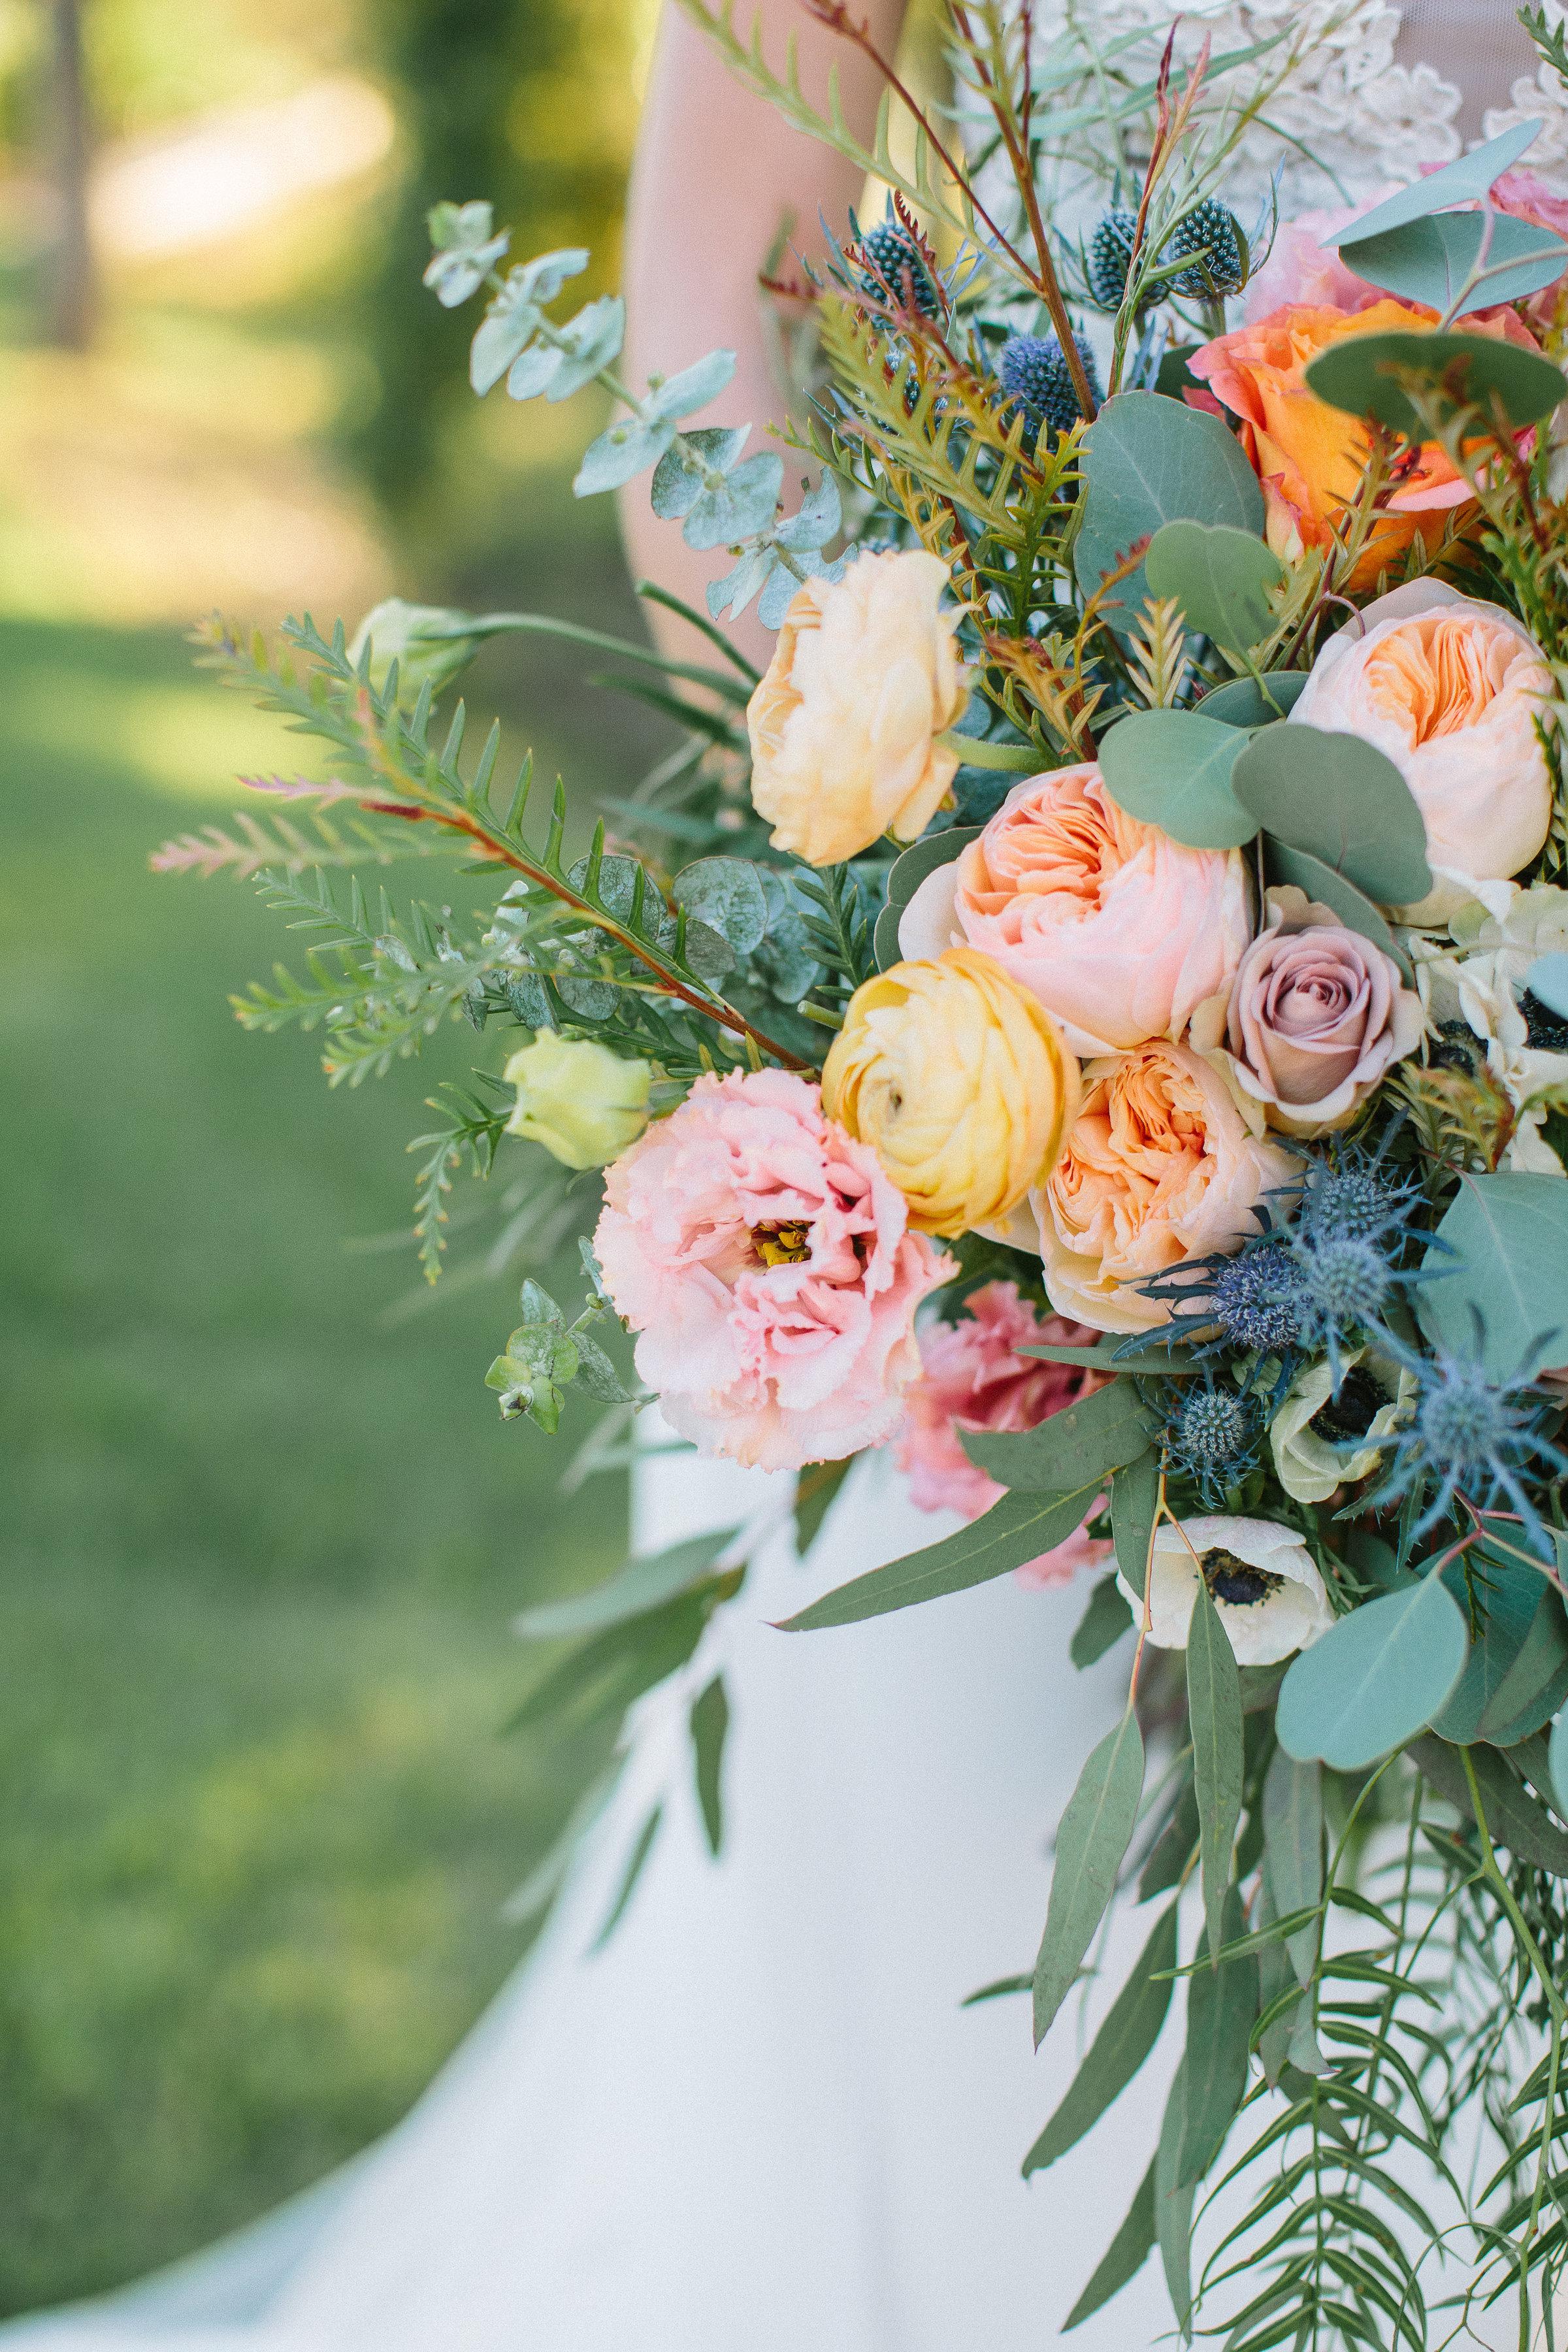 Ellen-Ashton-Photography-Peach-Creek-Ranch-Weddings-Wed-and-Prosper266